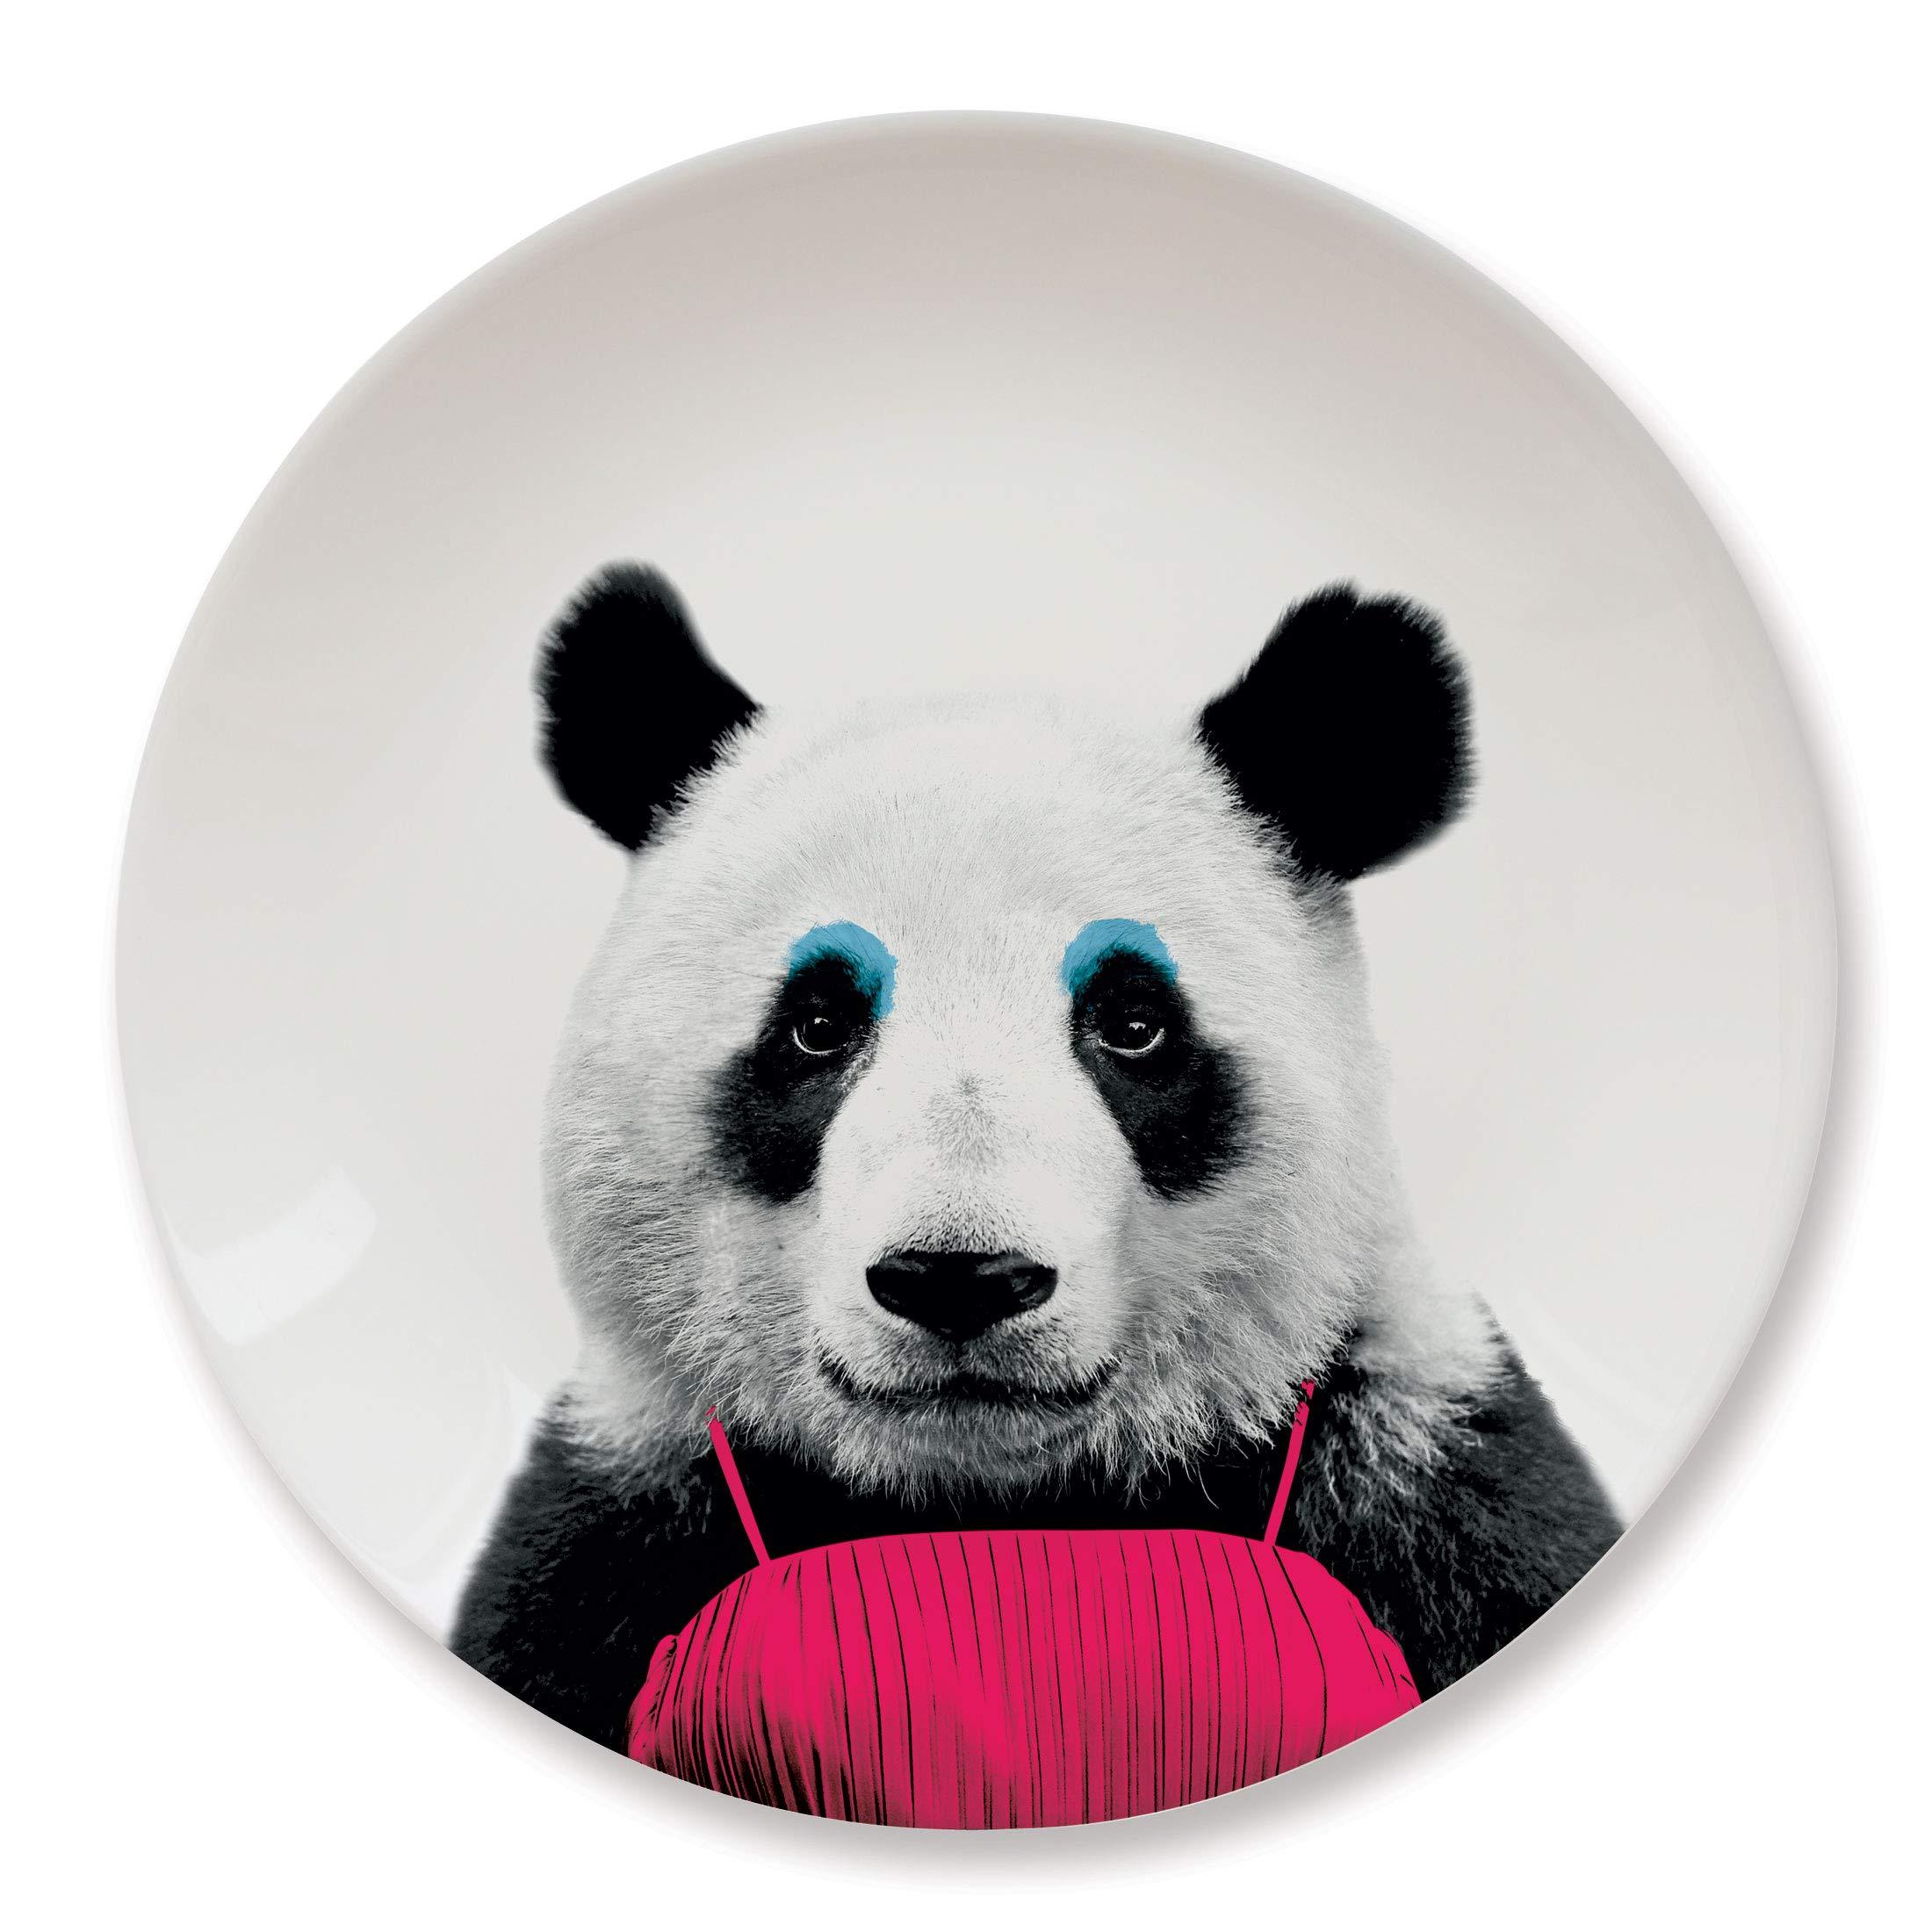 MUSTARD Ceramic Dinner Plate I Dishwasher safe I Dinnerware - Wild Dining Panda